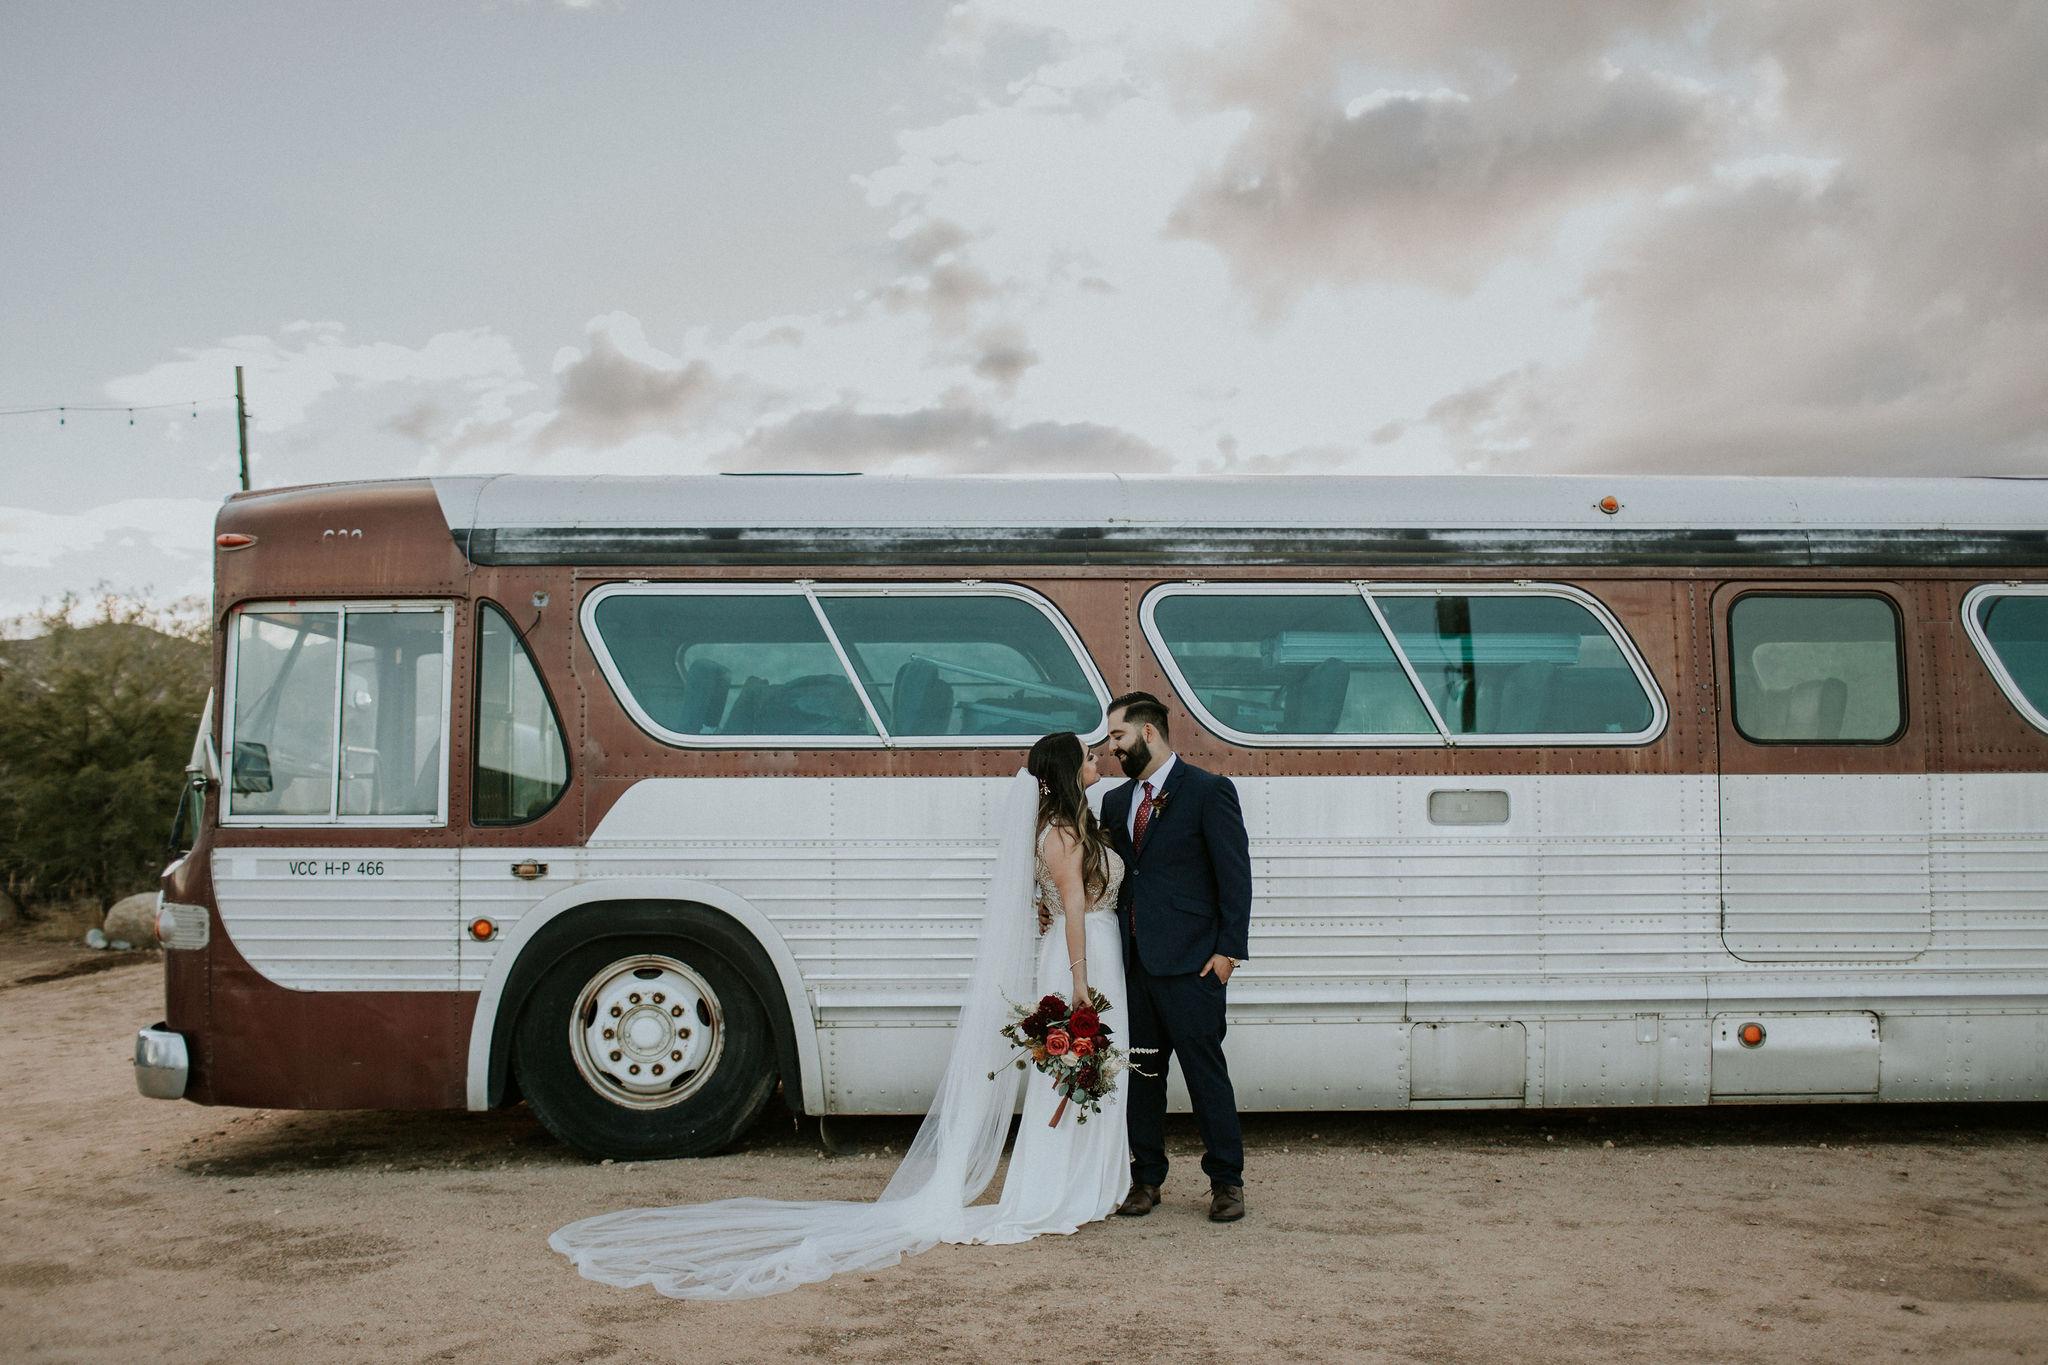 RimrockRanch-JoshuaTree-Wedding-Jami-Laree-694.jpg